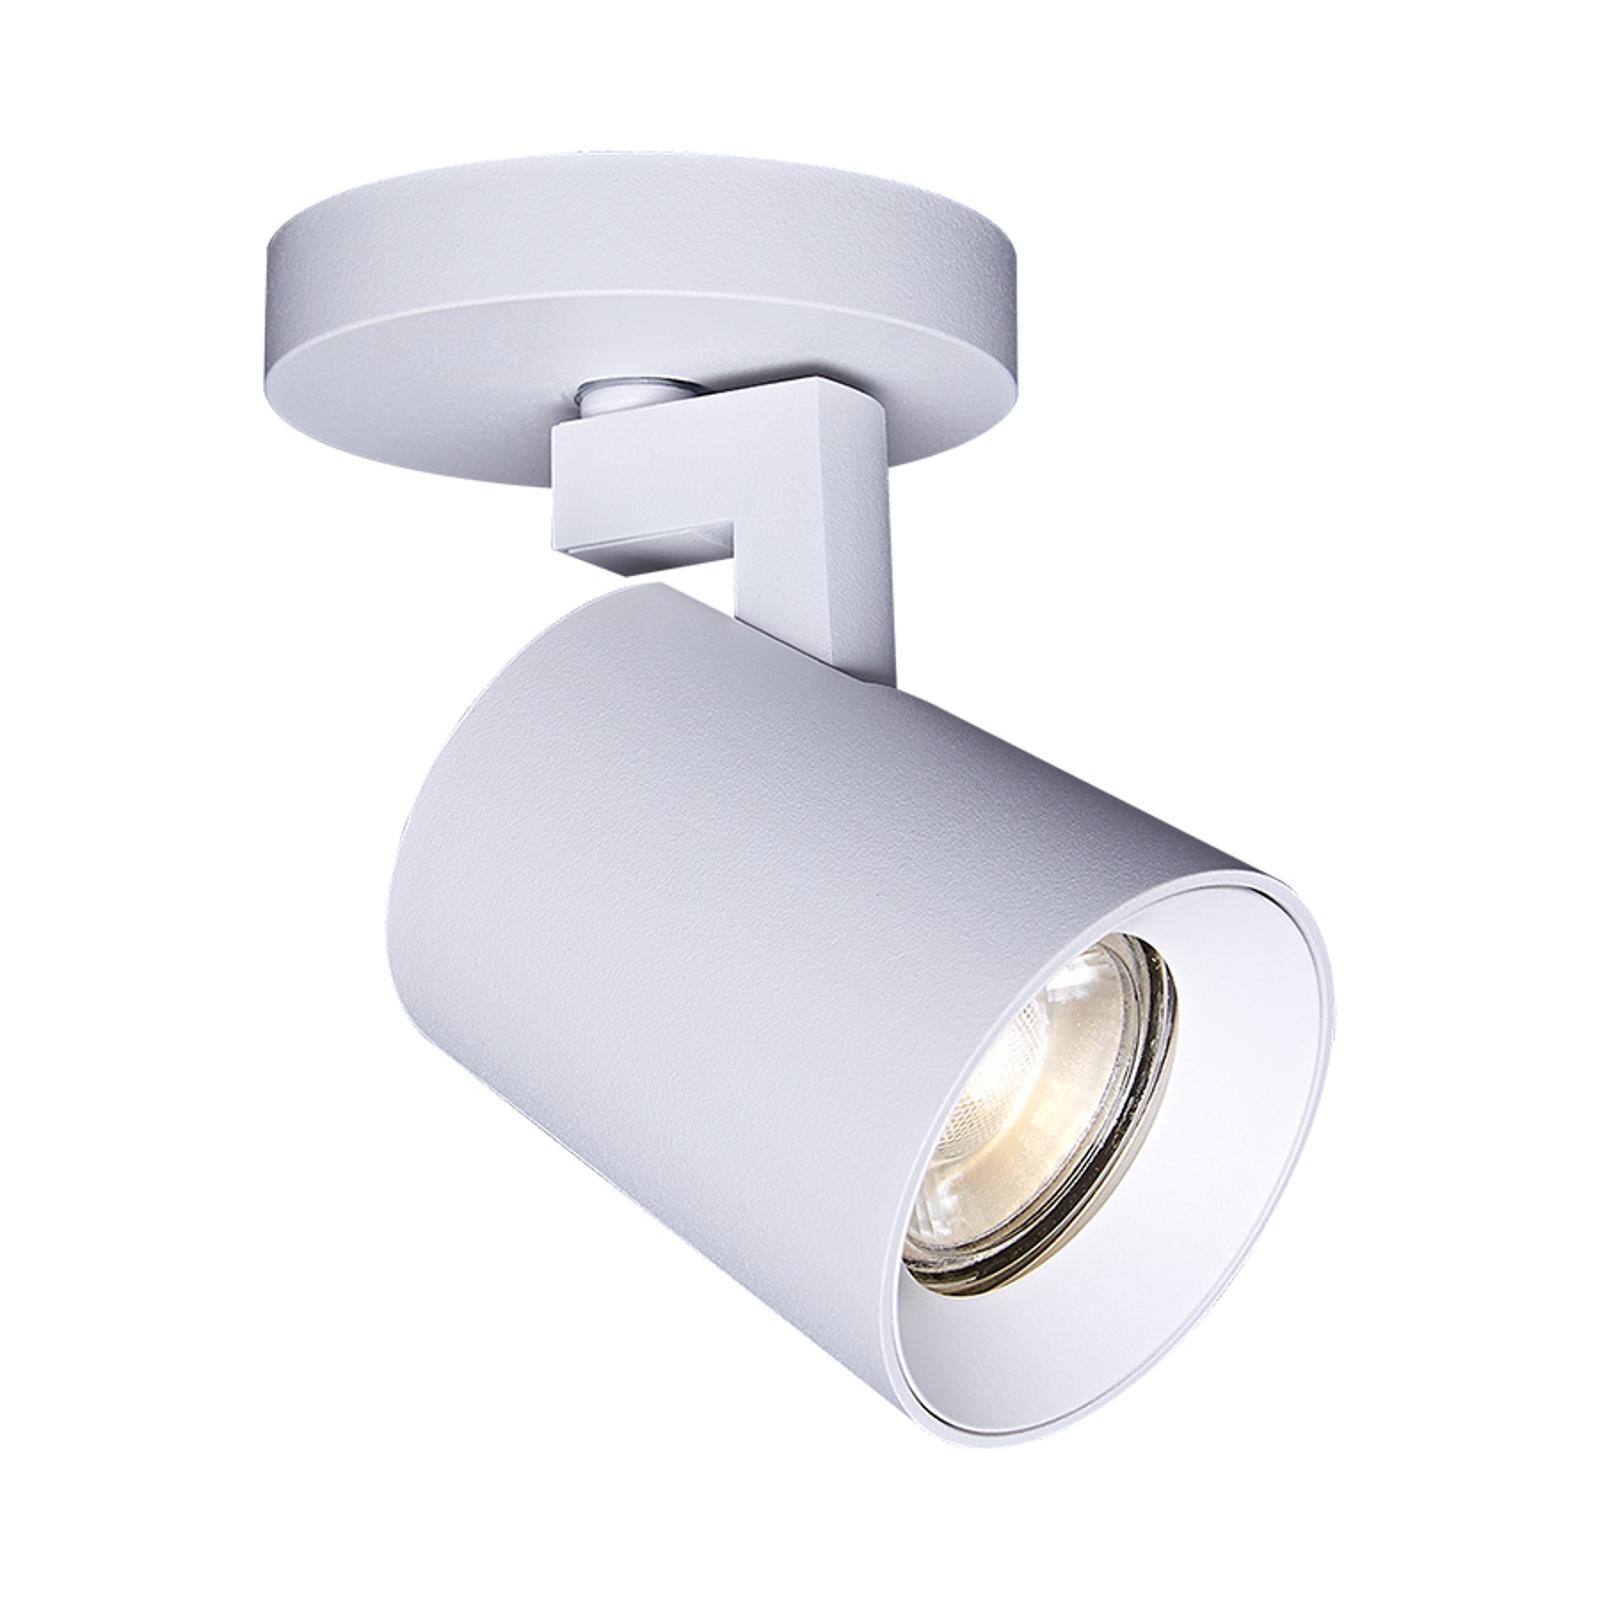 Arcchio Bilko lyskaster, 1 lyskilde, hvit